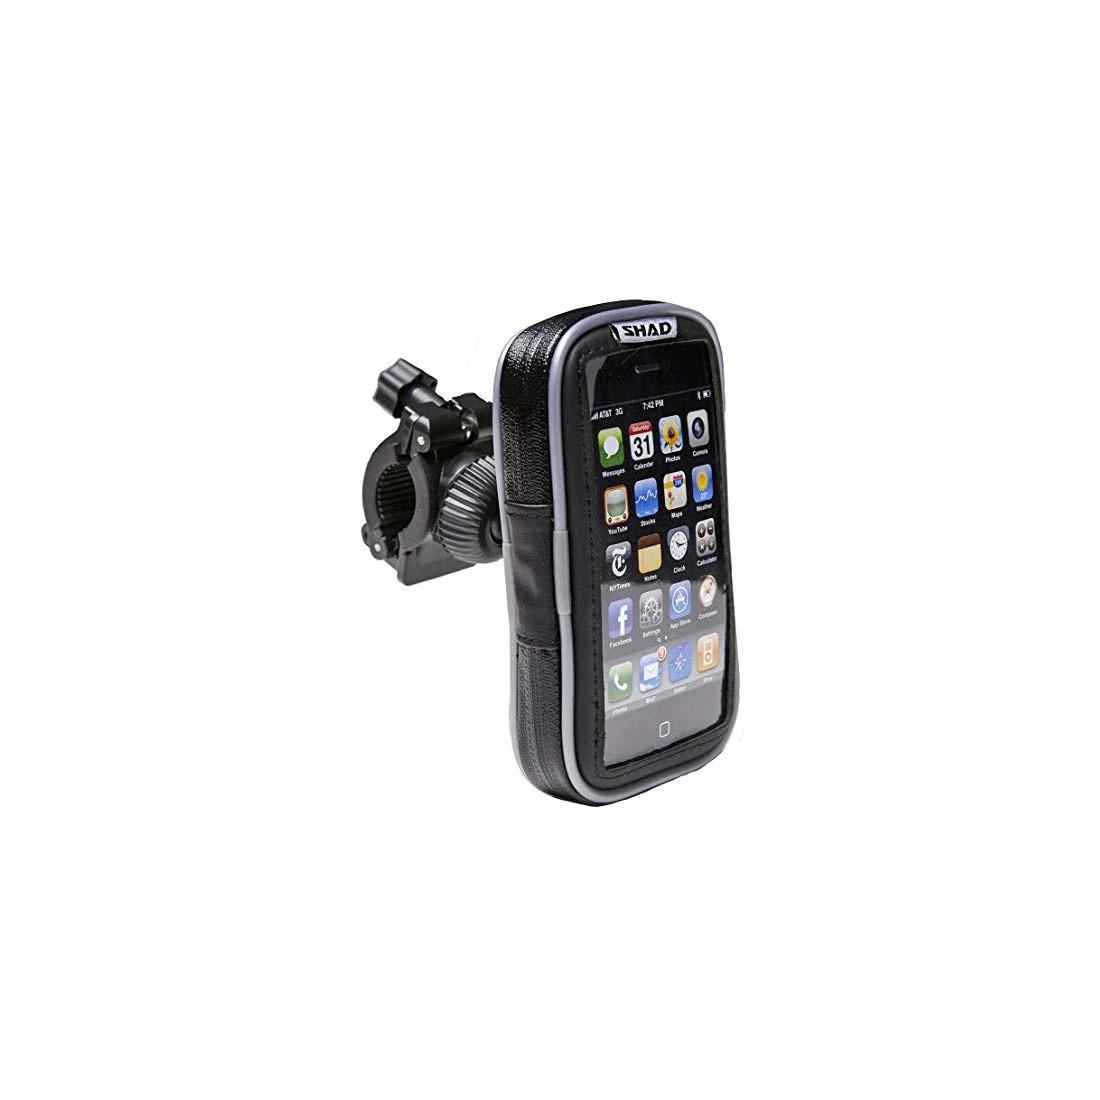 "Soporte Shad Smartphone Manillar 4,3"""